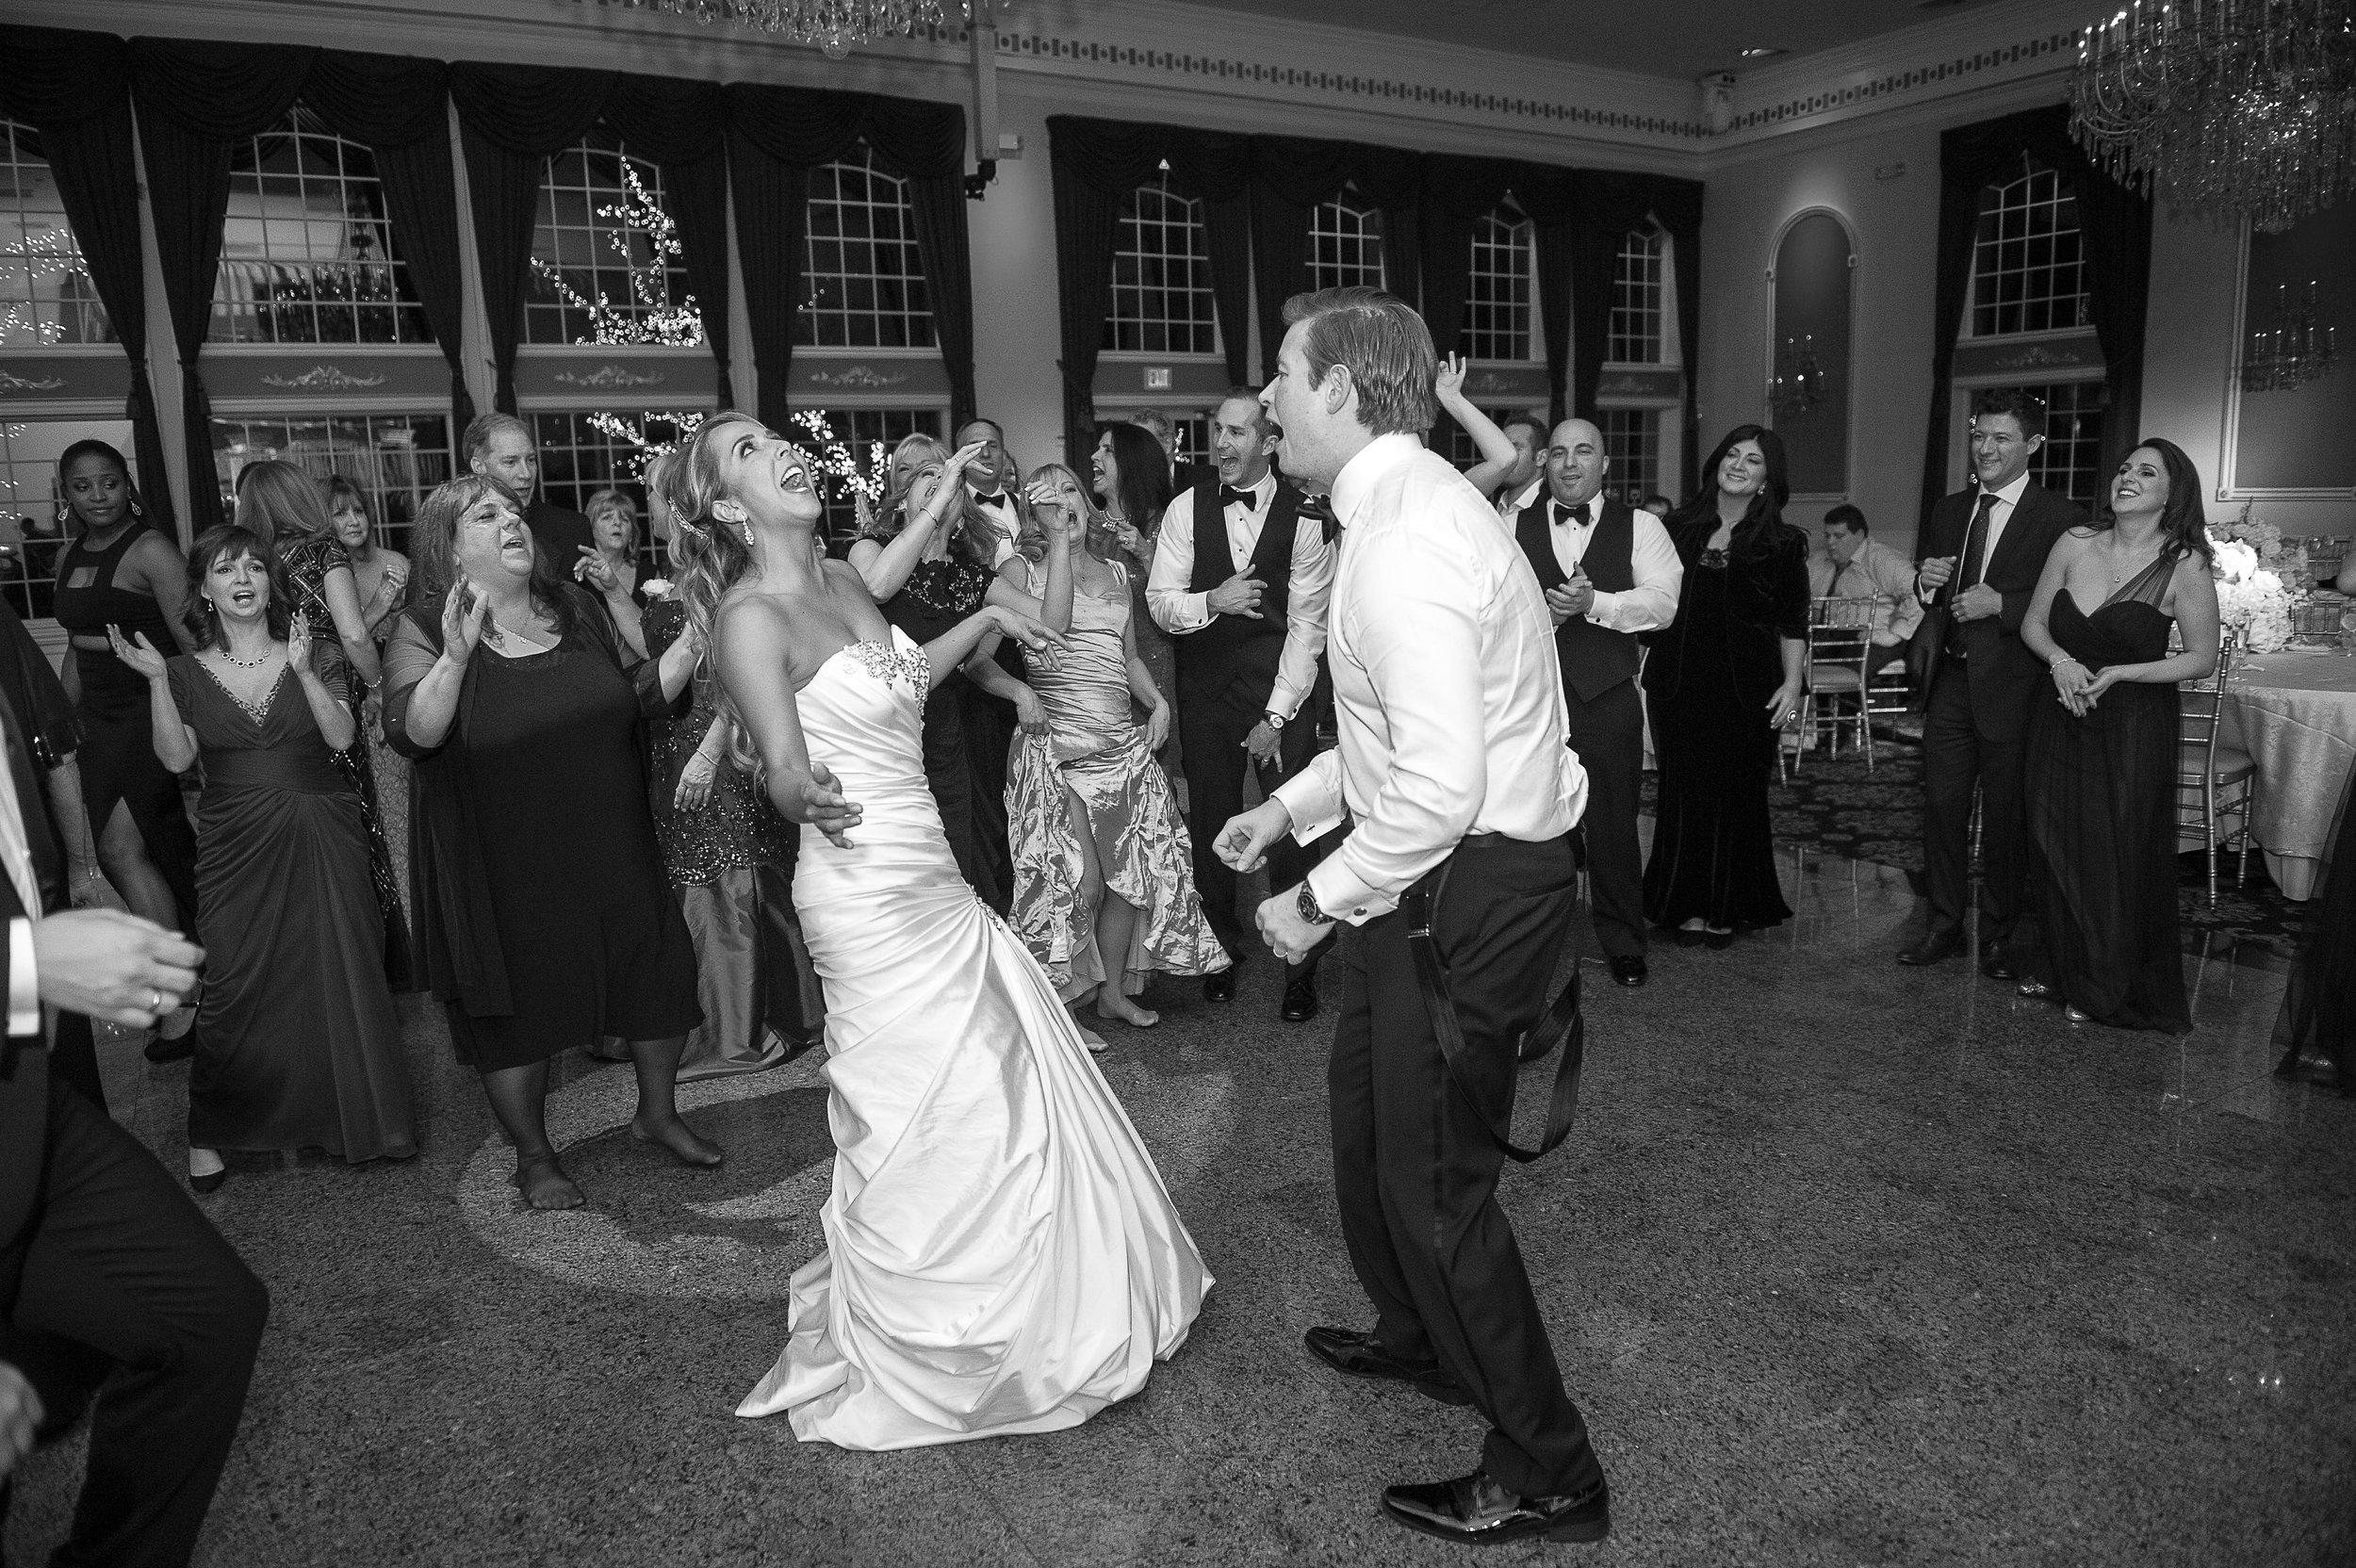 Ceci_New_York_Custom_Invitation_ New_Jersey_Wedding_Luxury_Personalized_Ceci_Style_Bride_Foil_Stamping130.JPG